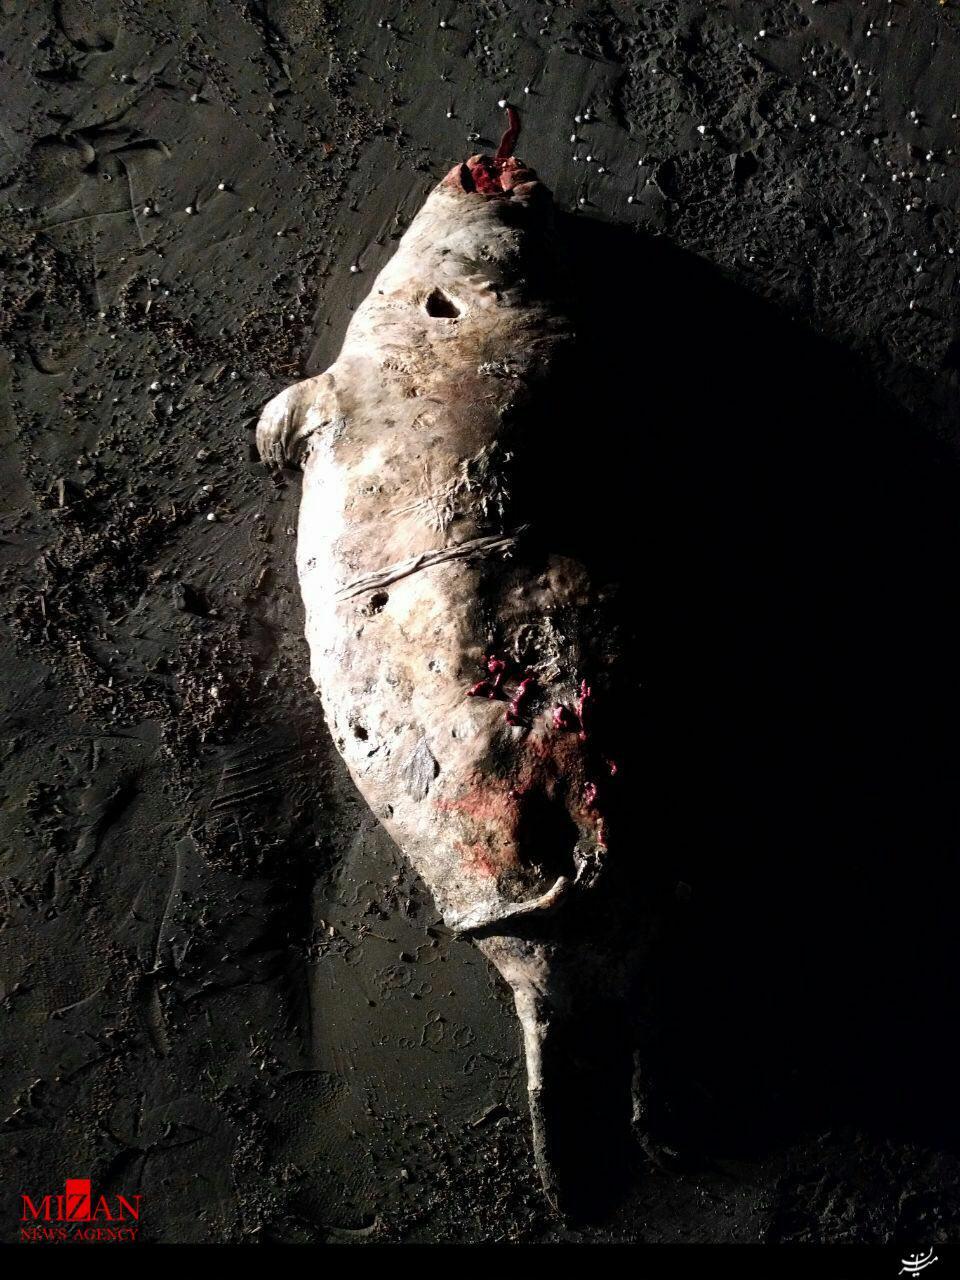 لاشه دو فوک خزری دیگر پیدا گردید +عکس